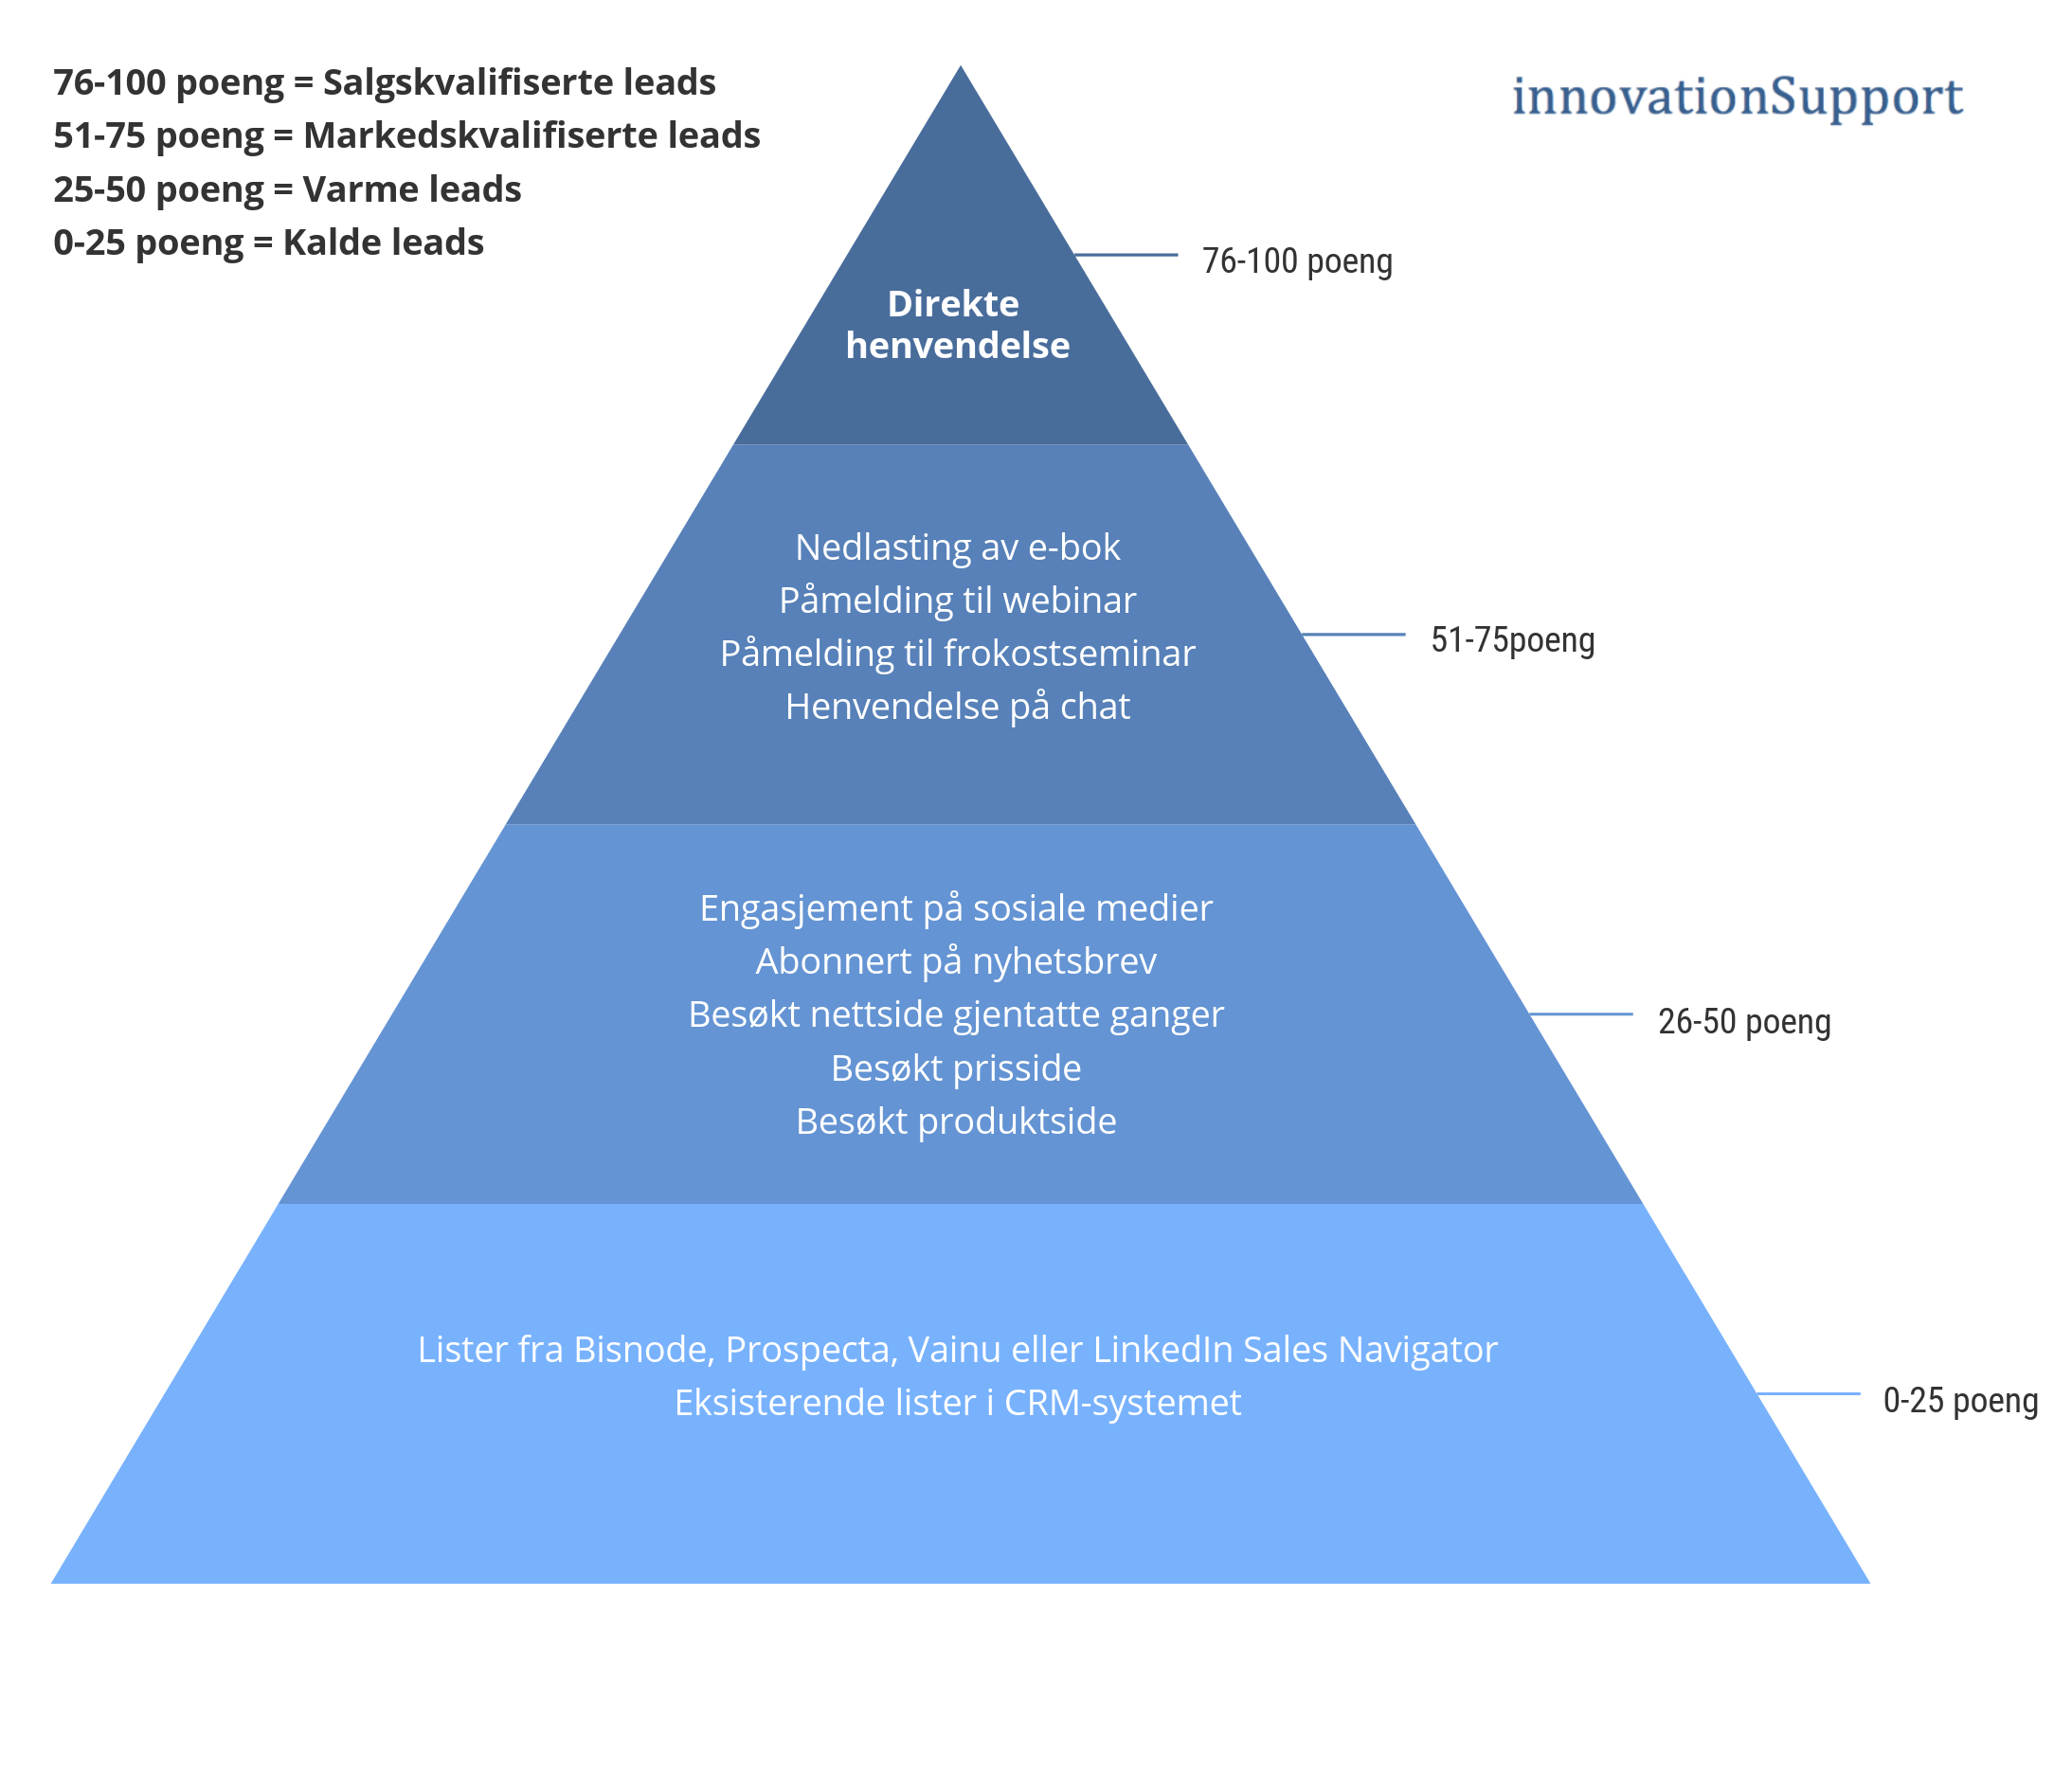 lead-scoring-innovation-support